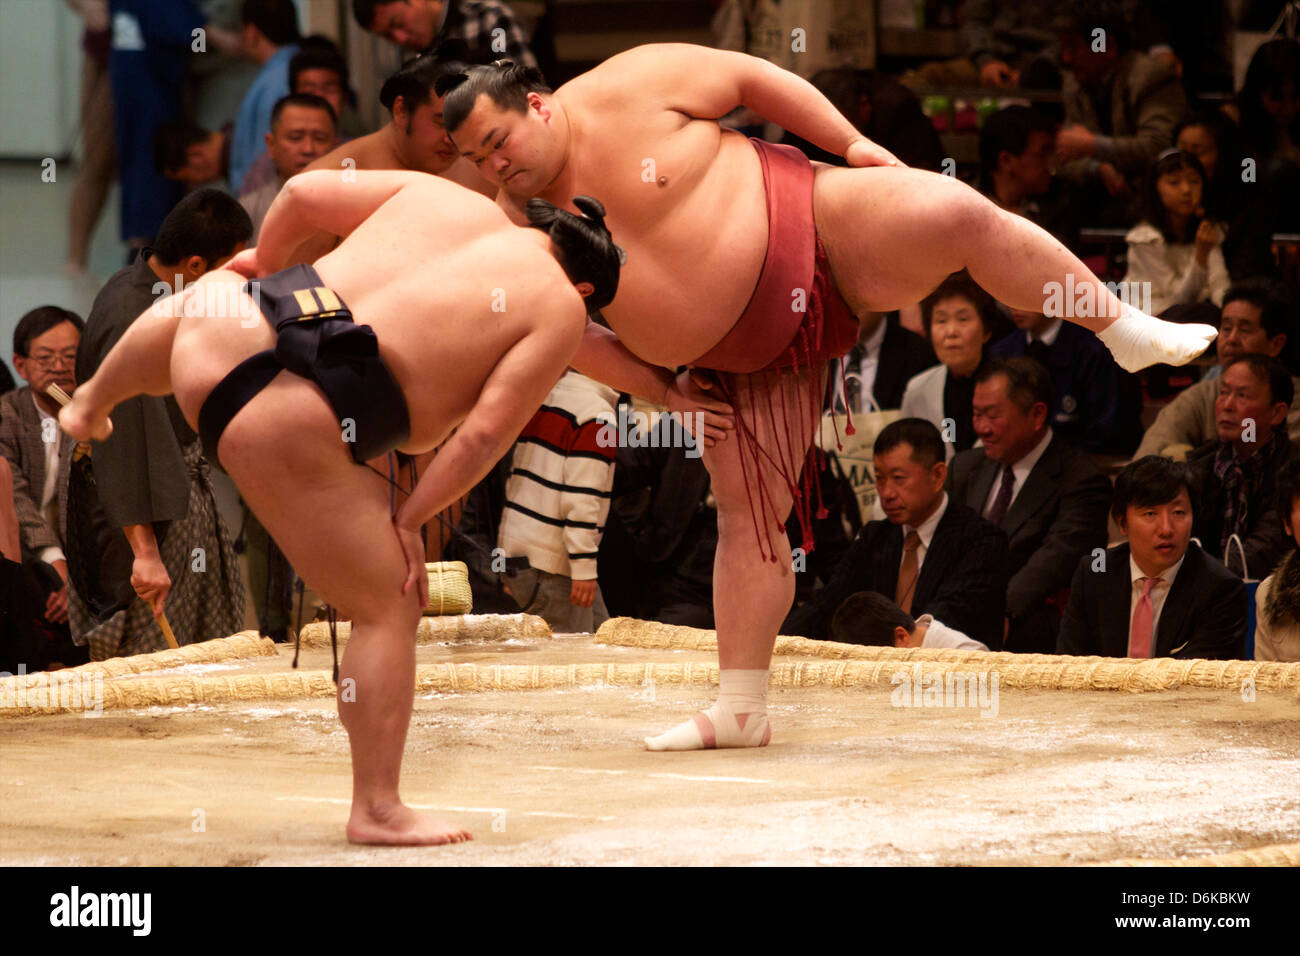 Sumo wrestling concorso al Kokugikan stadium, Tokyo, Giappone, Asia Immagini Stock